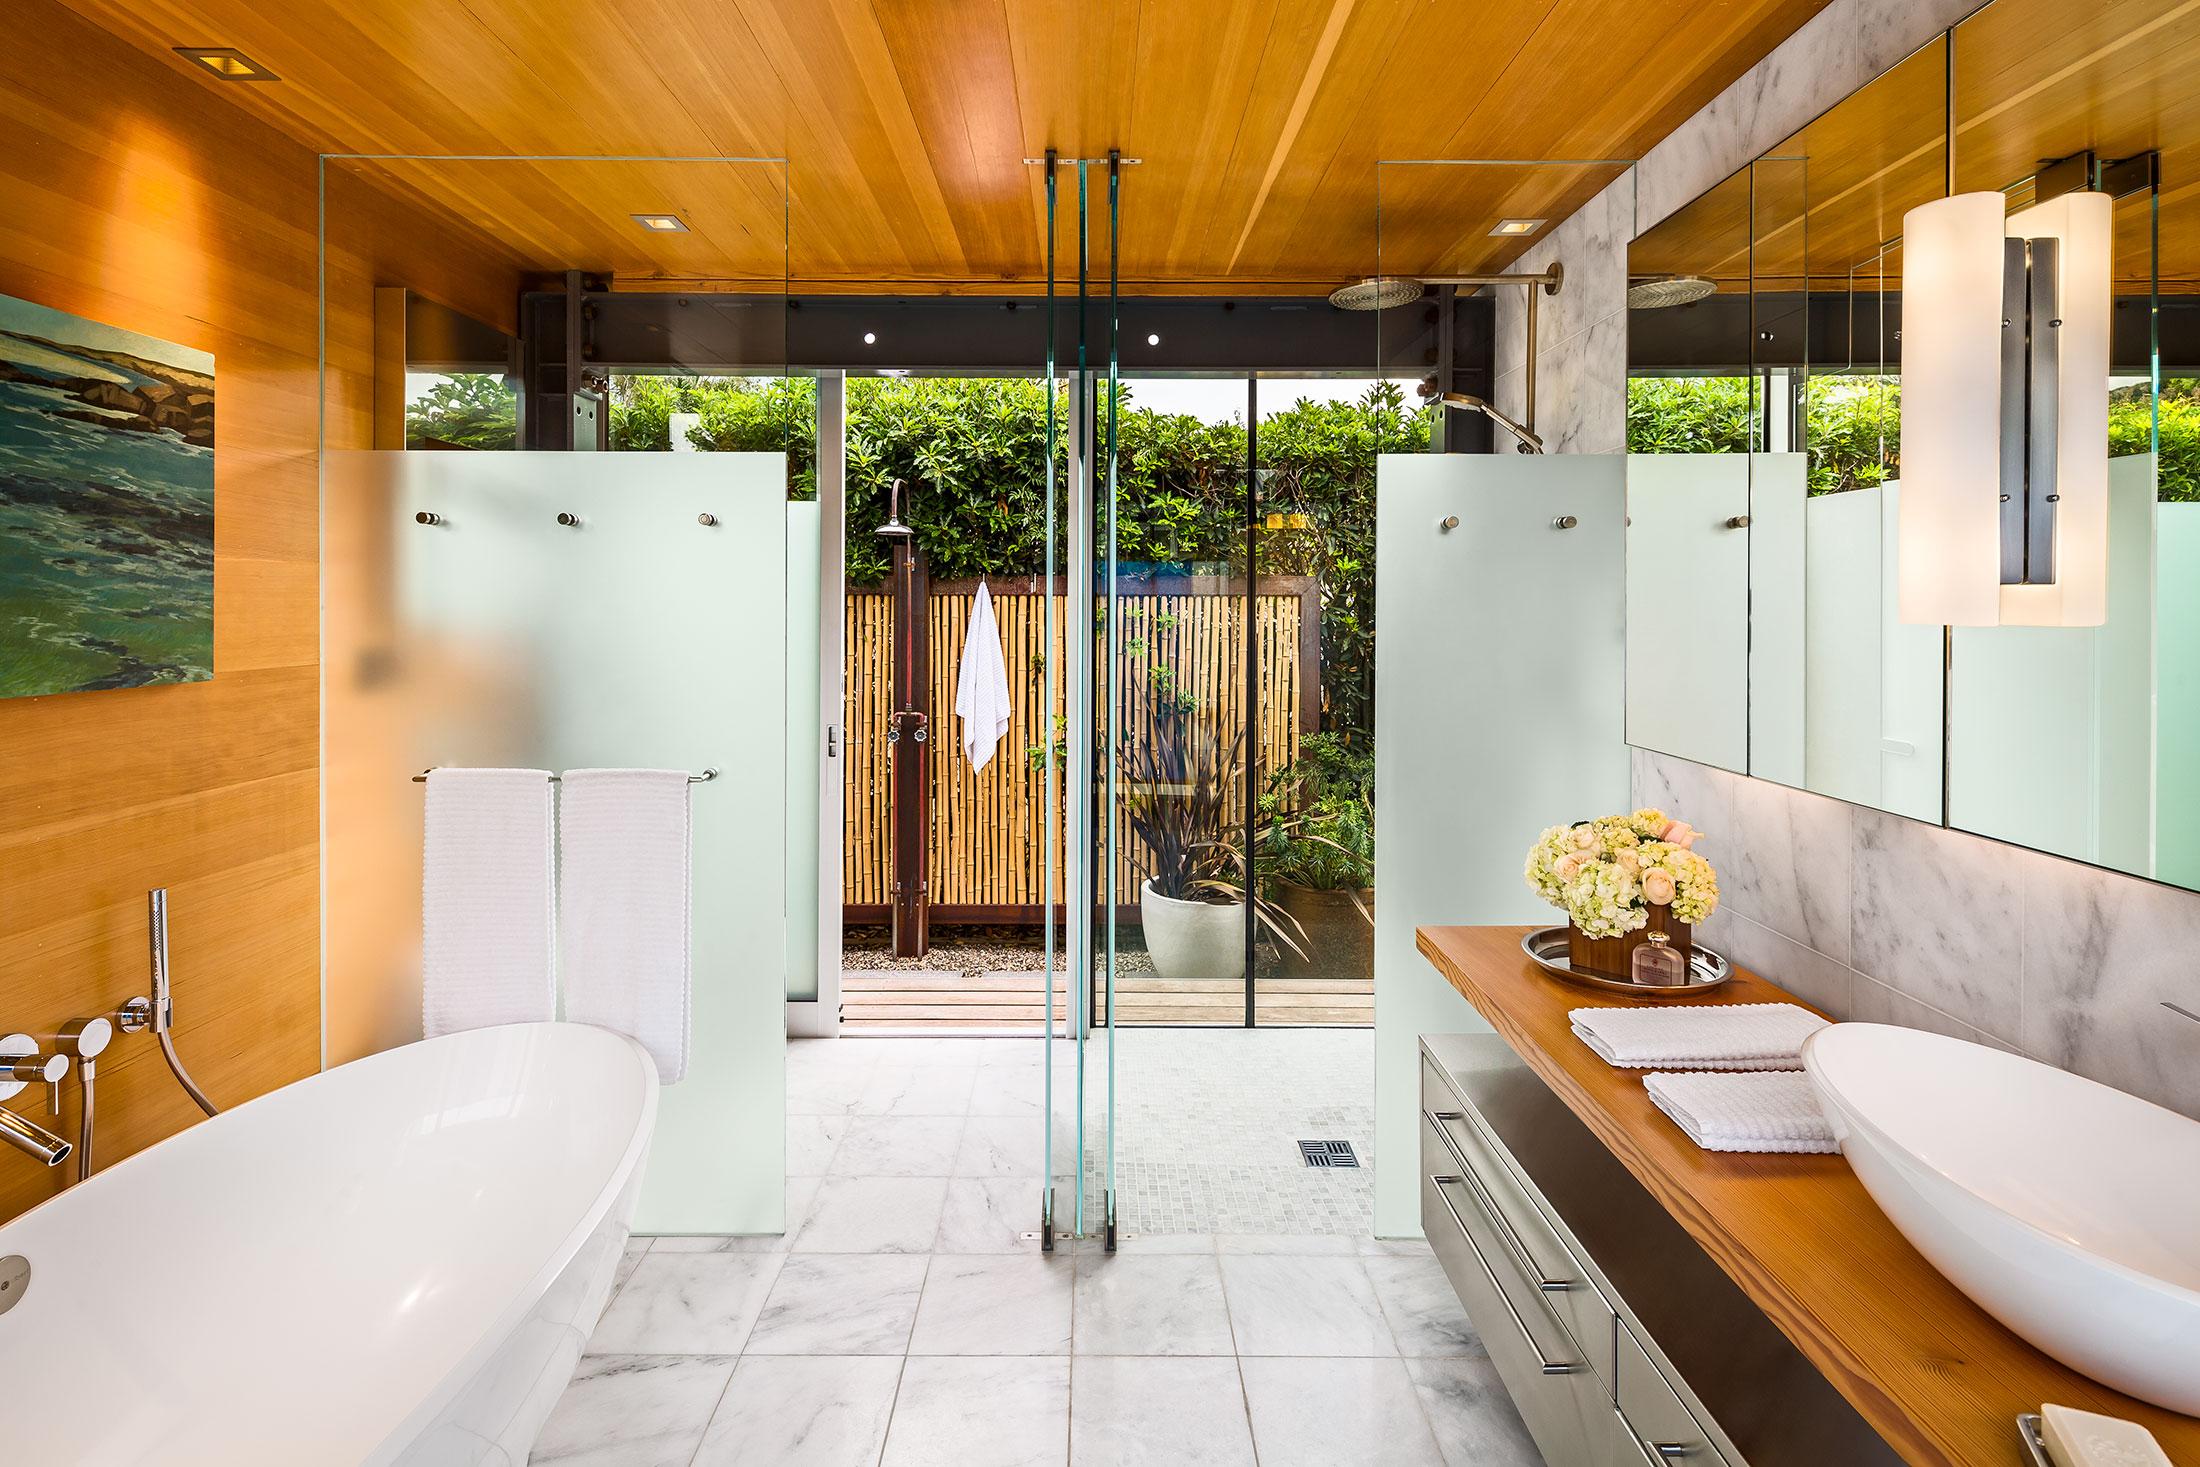 cl:20 modern residential addition prototype – shubin donaldson